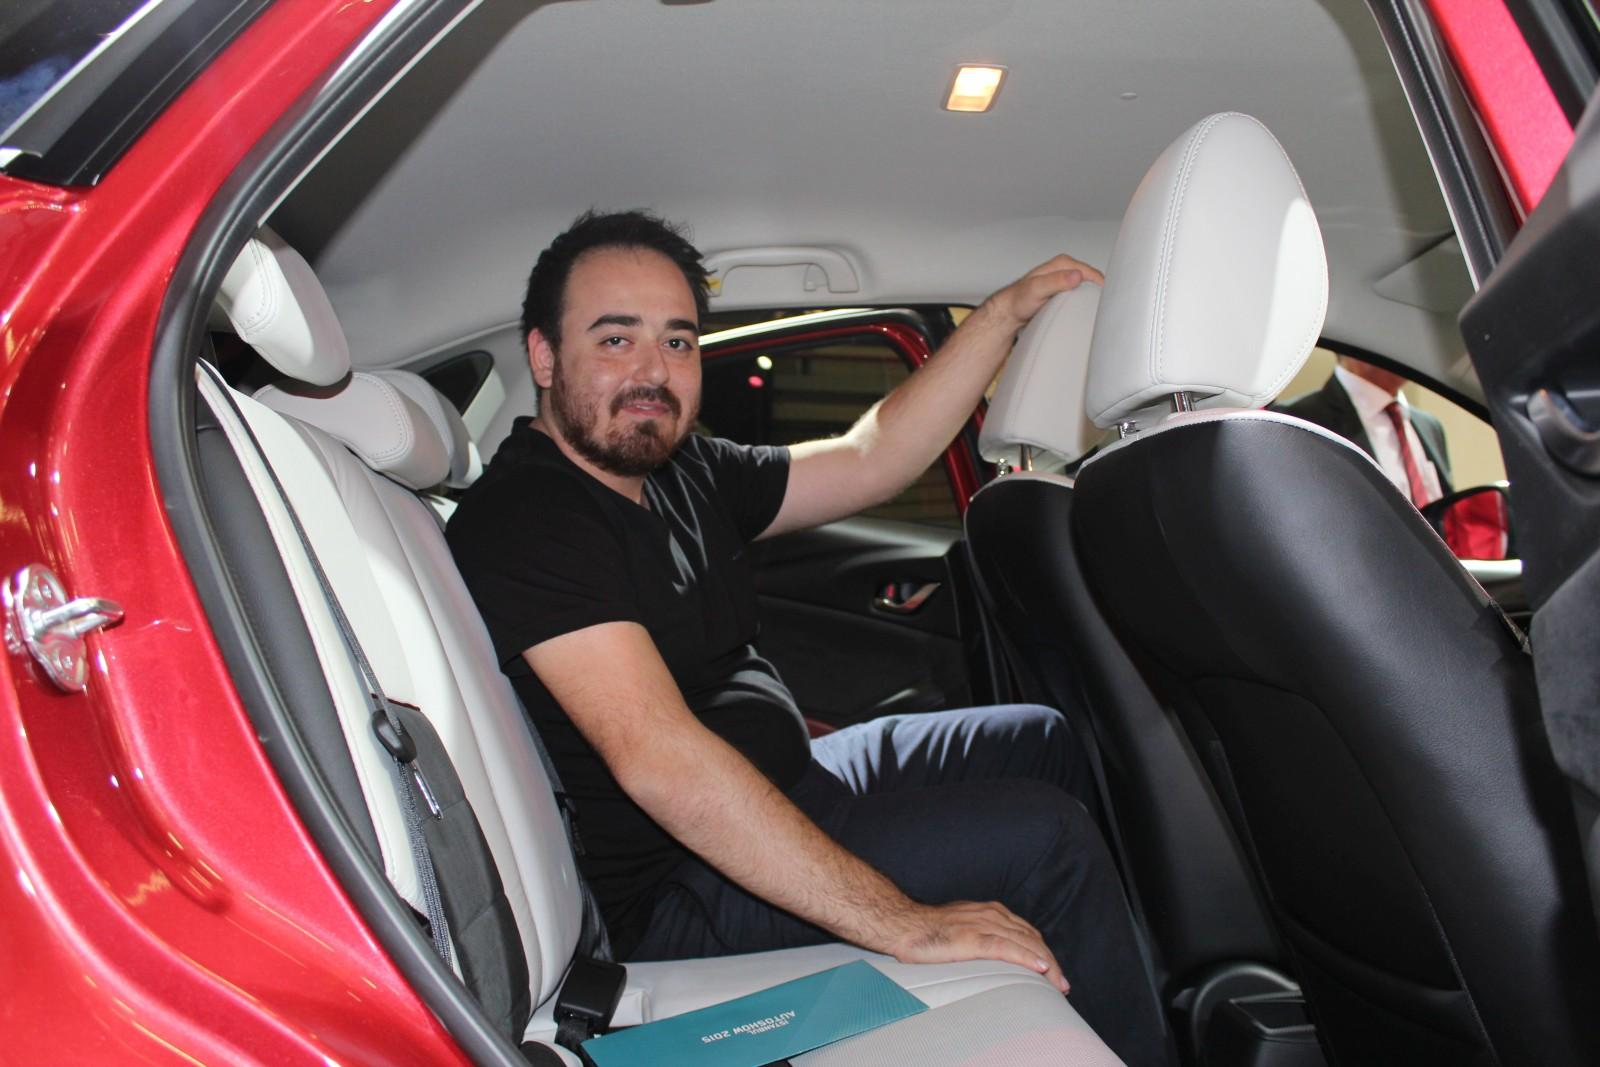 MazdaClubTR_IstanbulAutoshow2015-042.jpg